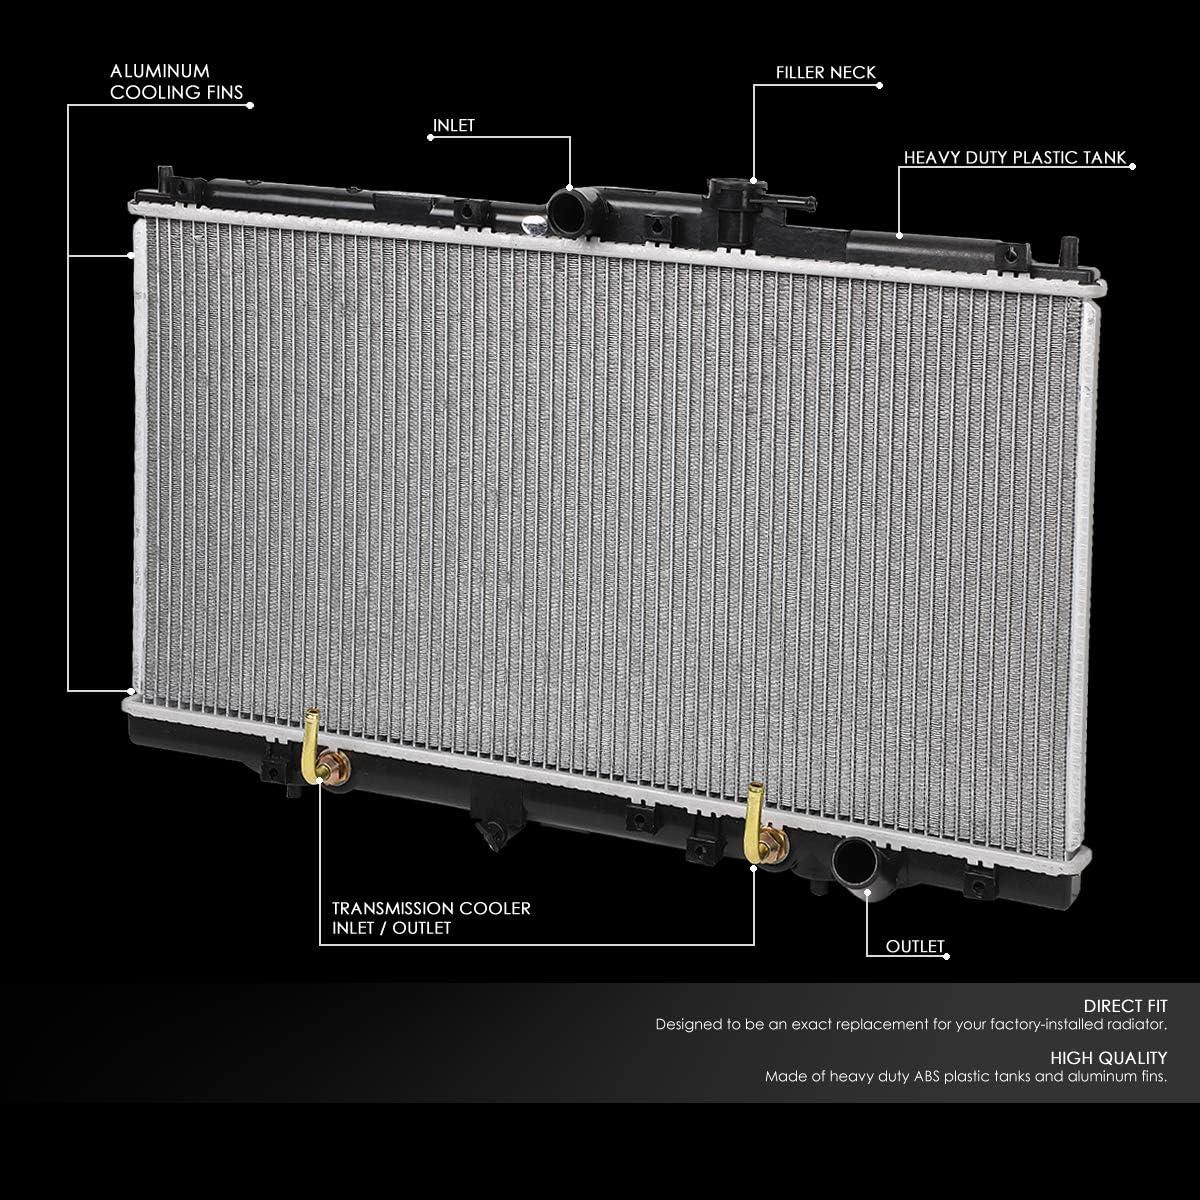 FOR 94-01 HONDA ACCORD 2.2L//PRELUDE AT PERFORMANCE ALUMINUM CORE RADIATOR 1494